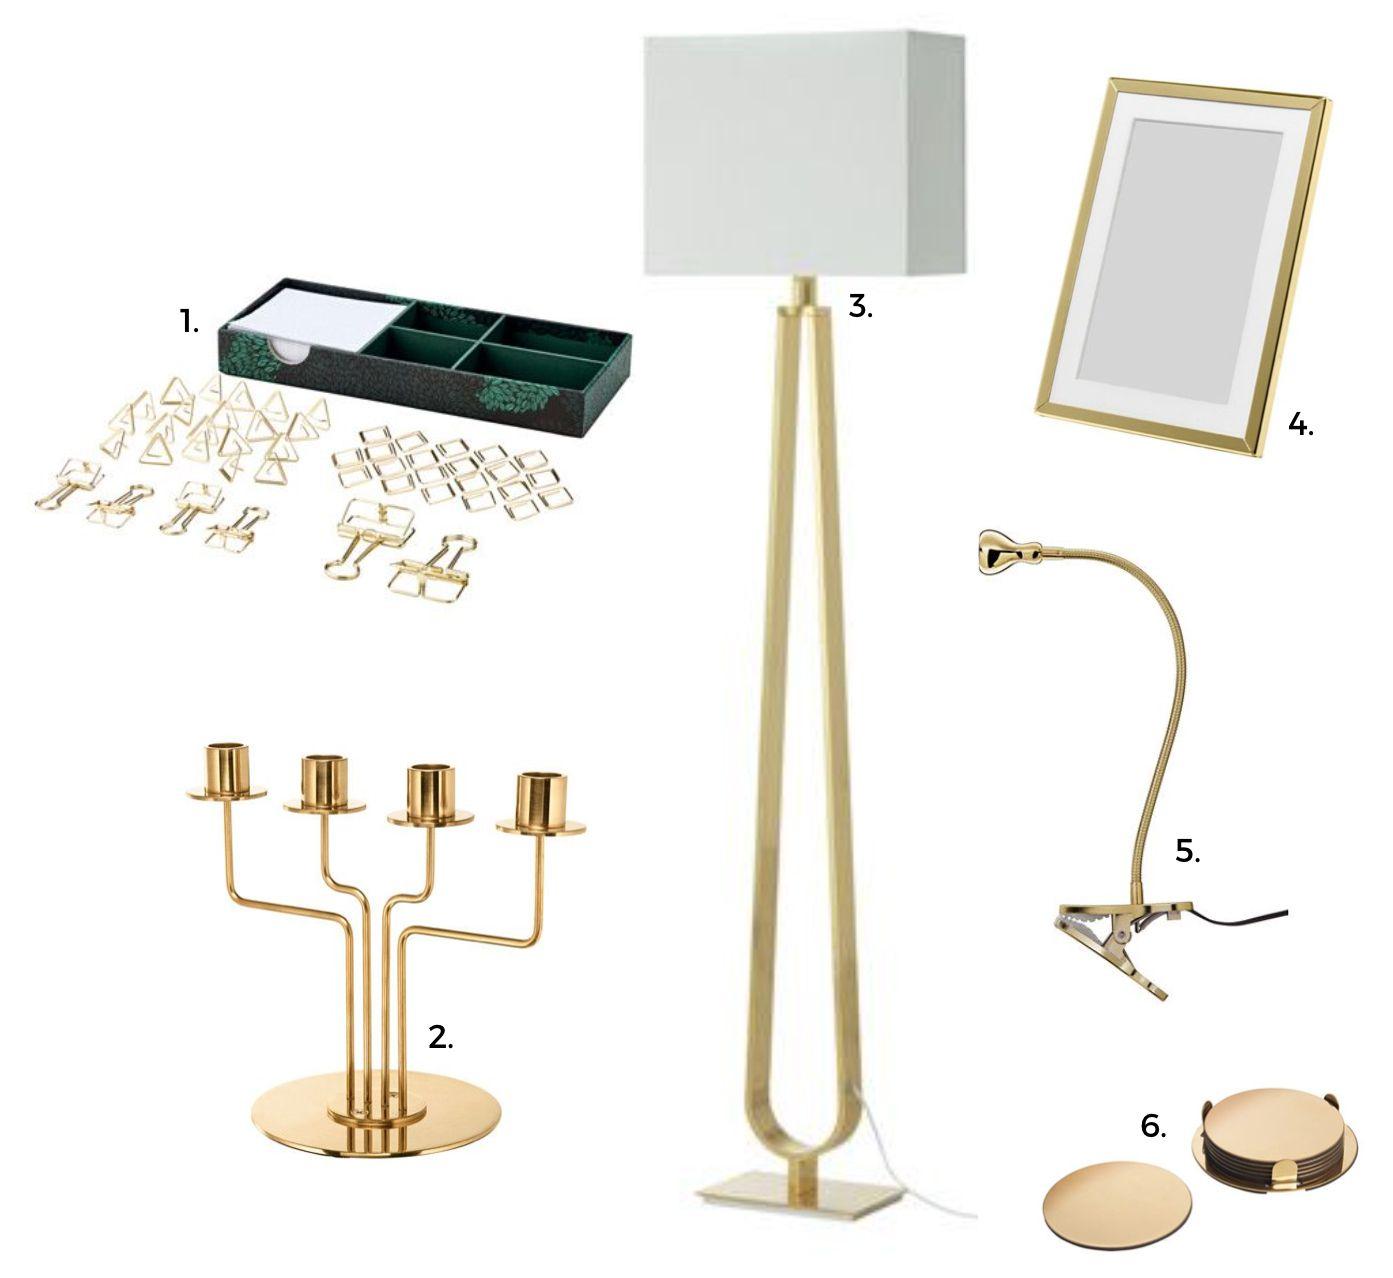 Full Size of Ikea Stehlampe Stehlampen Wohnzimmer Schirm Kaputt Dimmbar Dimmen Papier Ohne Lampe Deckenfluter Not Lampenschirm Hektar Miniküche Betten 160x200 Küche Wohnzimmer Ikea Stehlampe